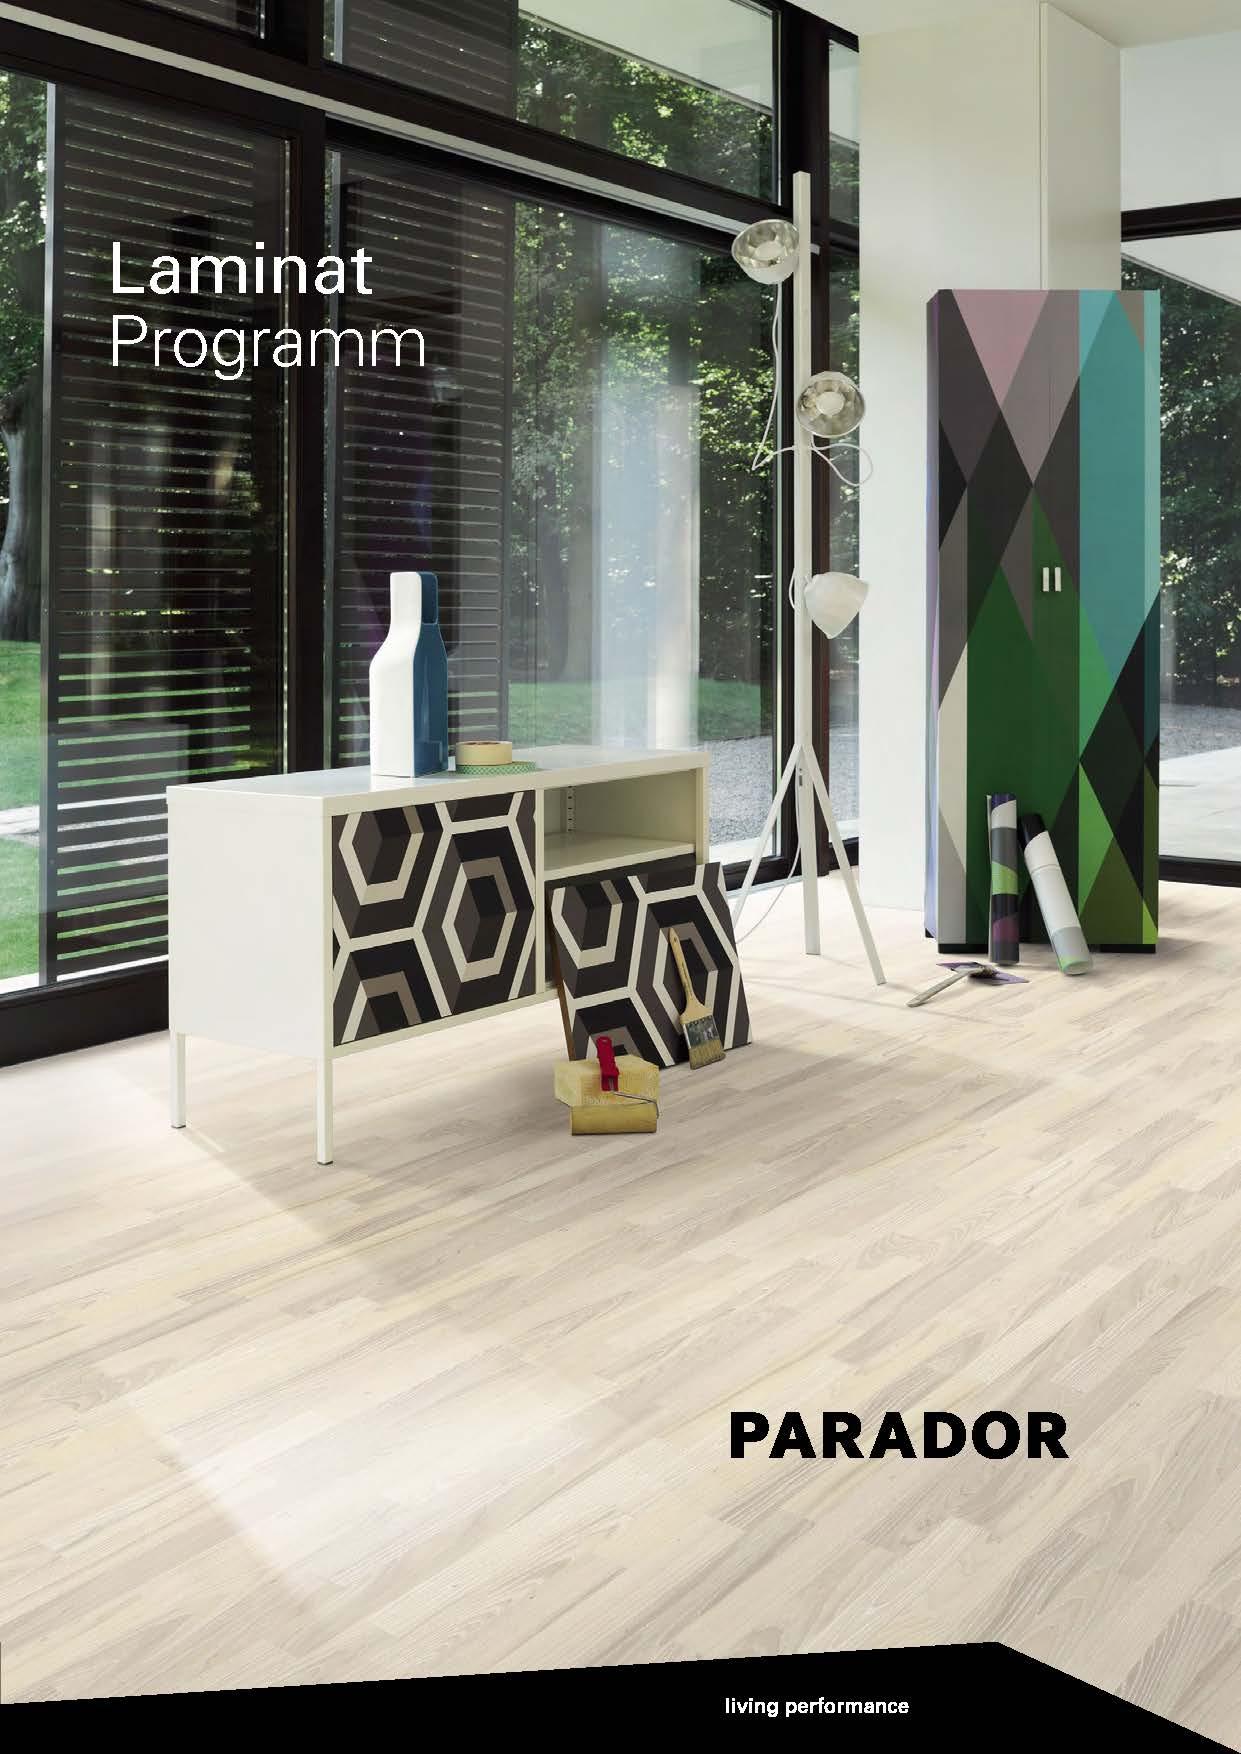 bauholz kvh terrasse zaun parkett paneel augsburg m nchen landsberg massivholzdielen holz. Black Bedroom Furniture Sets. Home Design Ideas